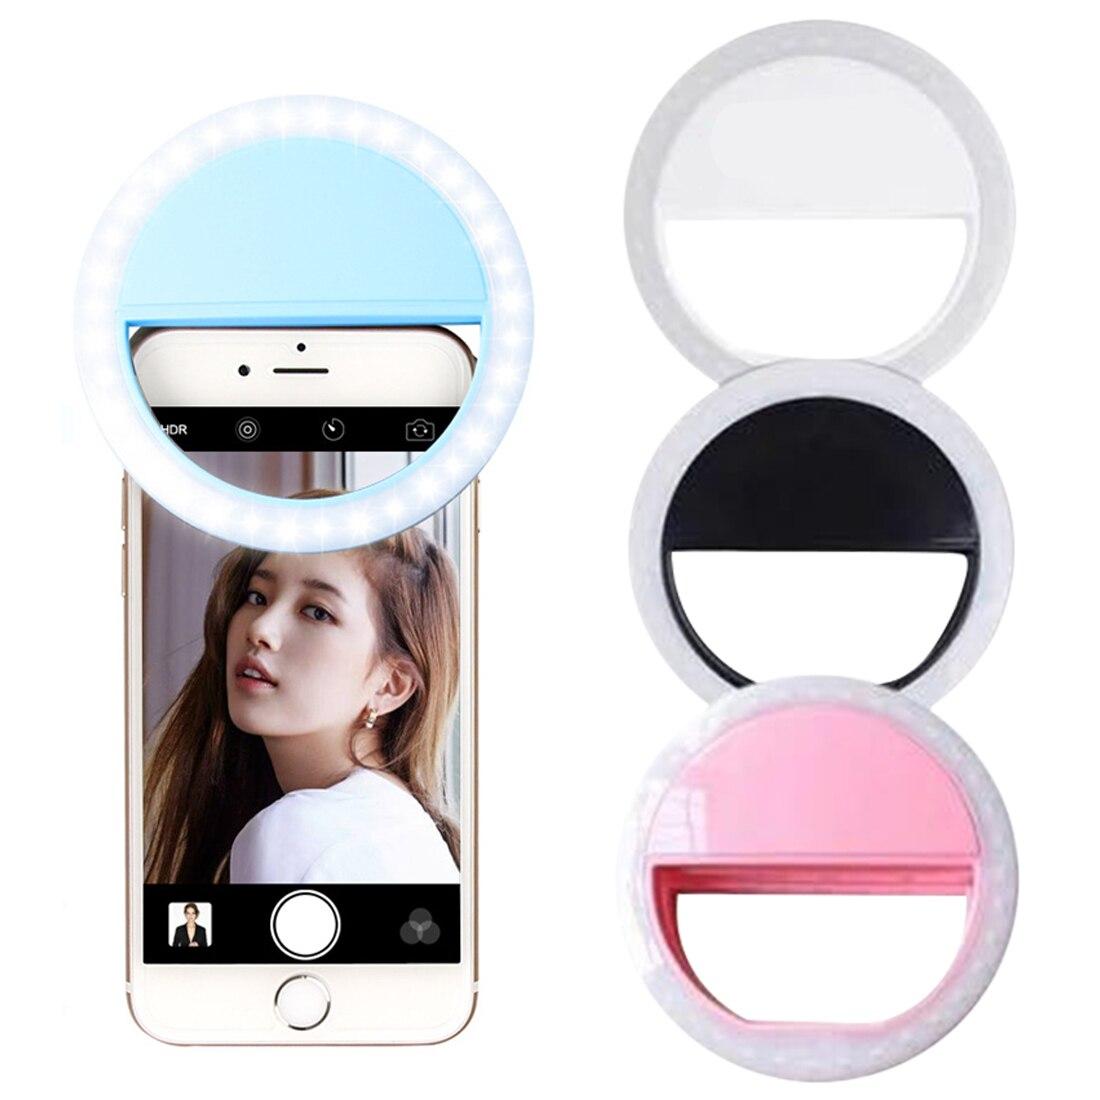 Mobile Phone Fill Light Portable Selfie Ring Flash Led Light Lamp External Photography Round Self-timer Lamp Photo LED Flash